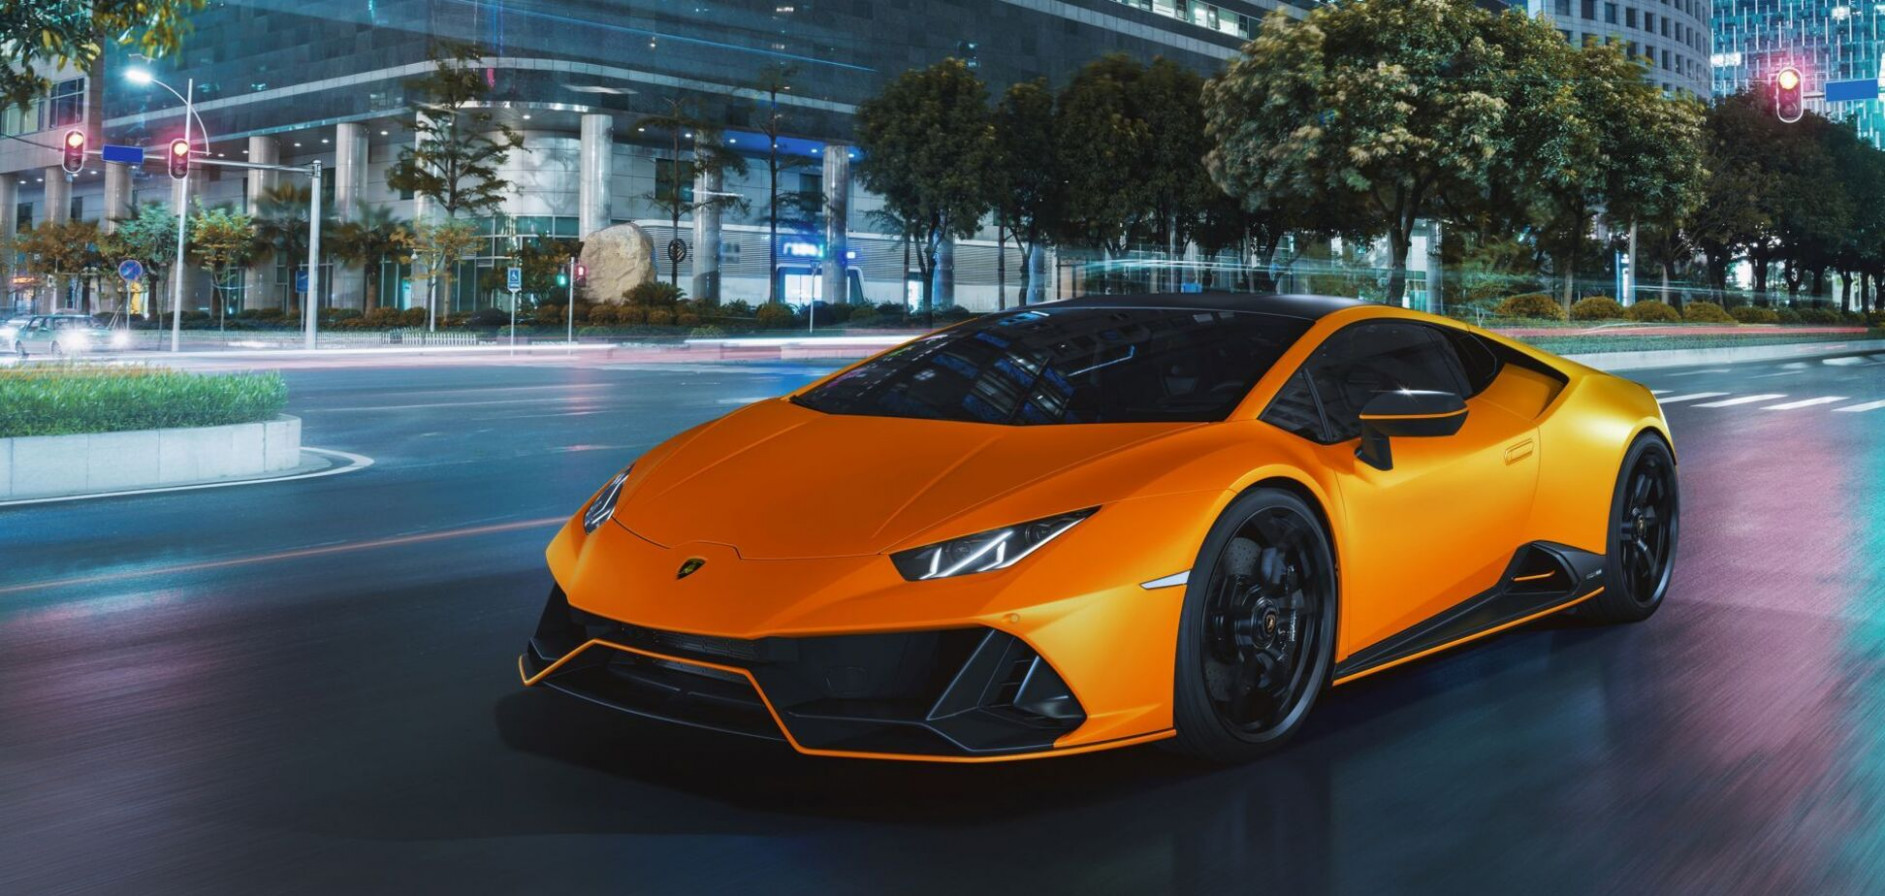 Picture 2022 Lamborghini Huracan